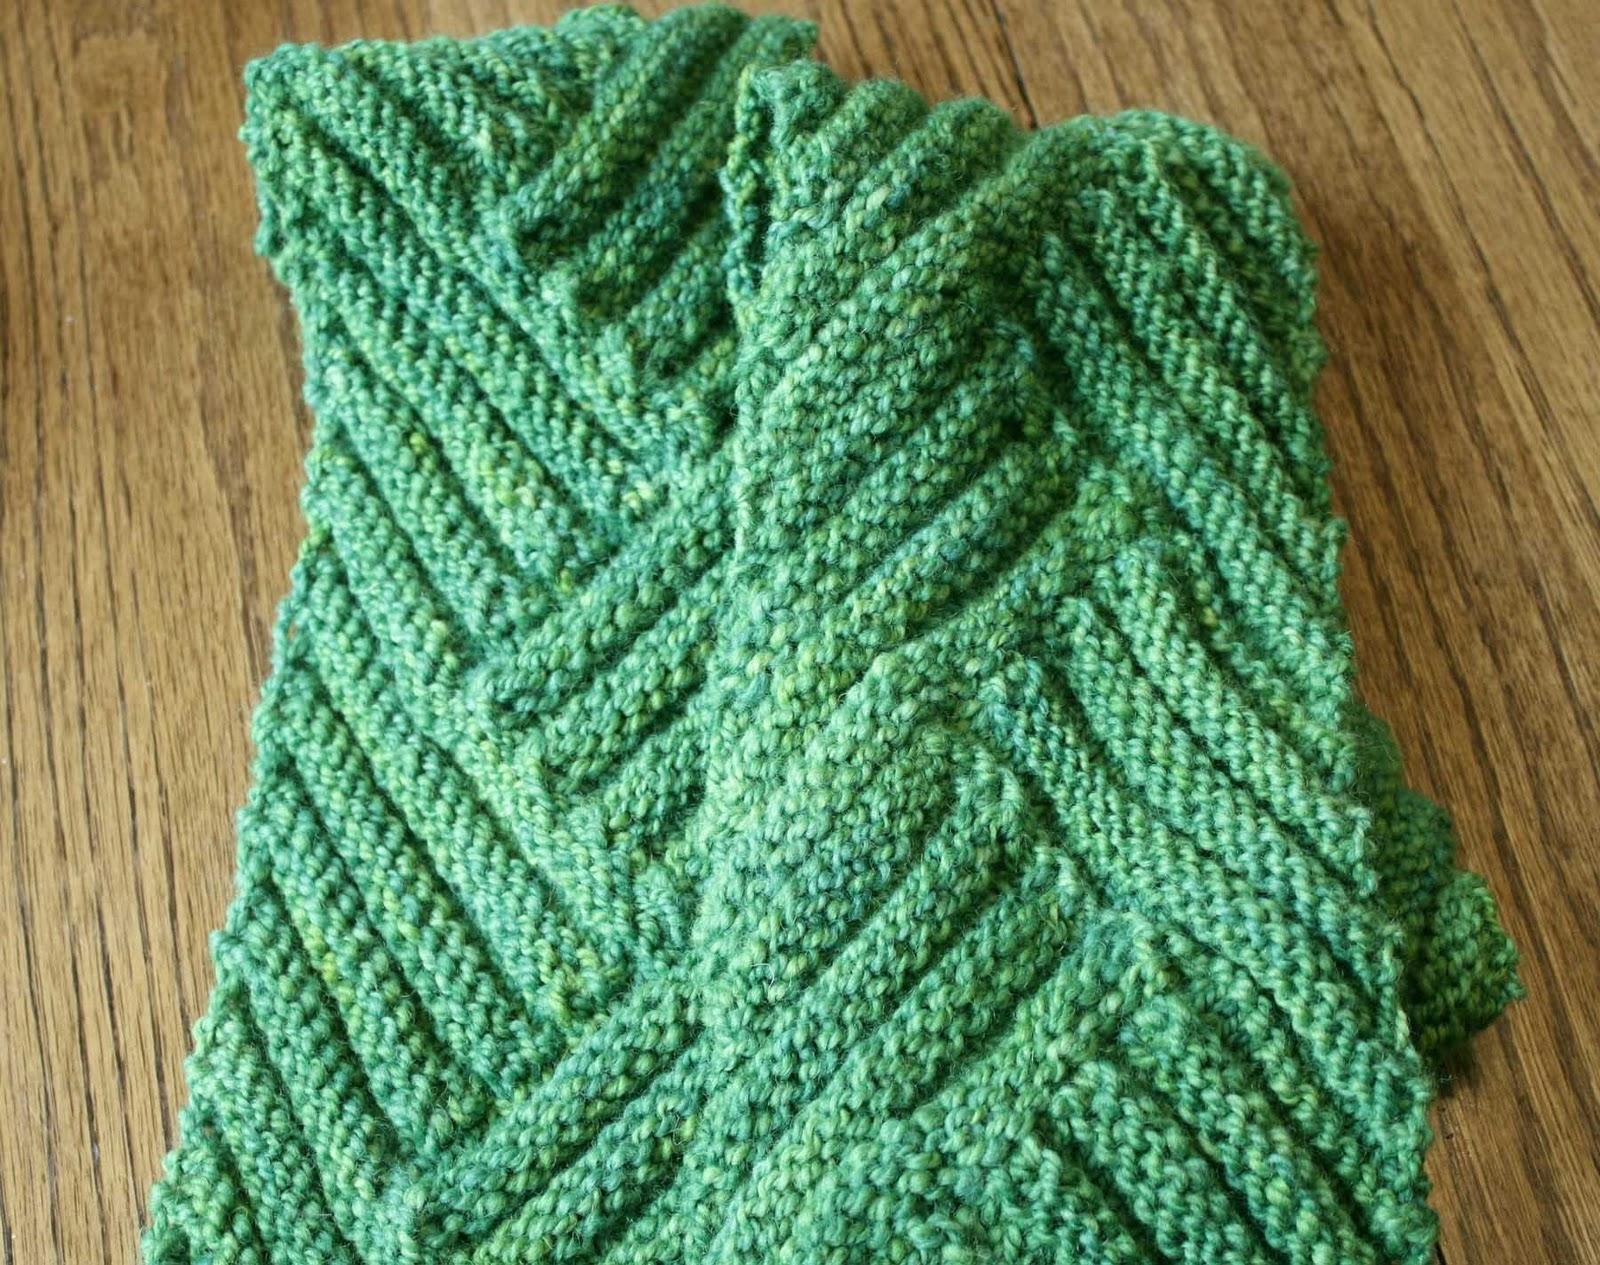 Short Row Scarf Knitting Pattern : Needles of Iron: February 2011